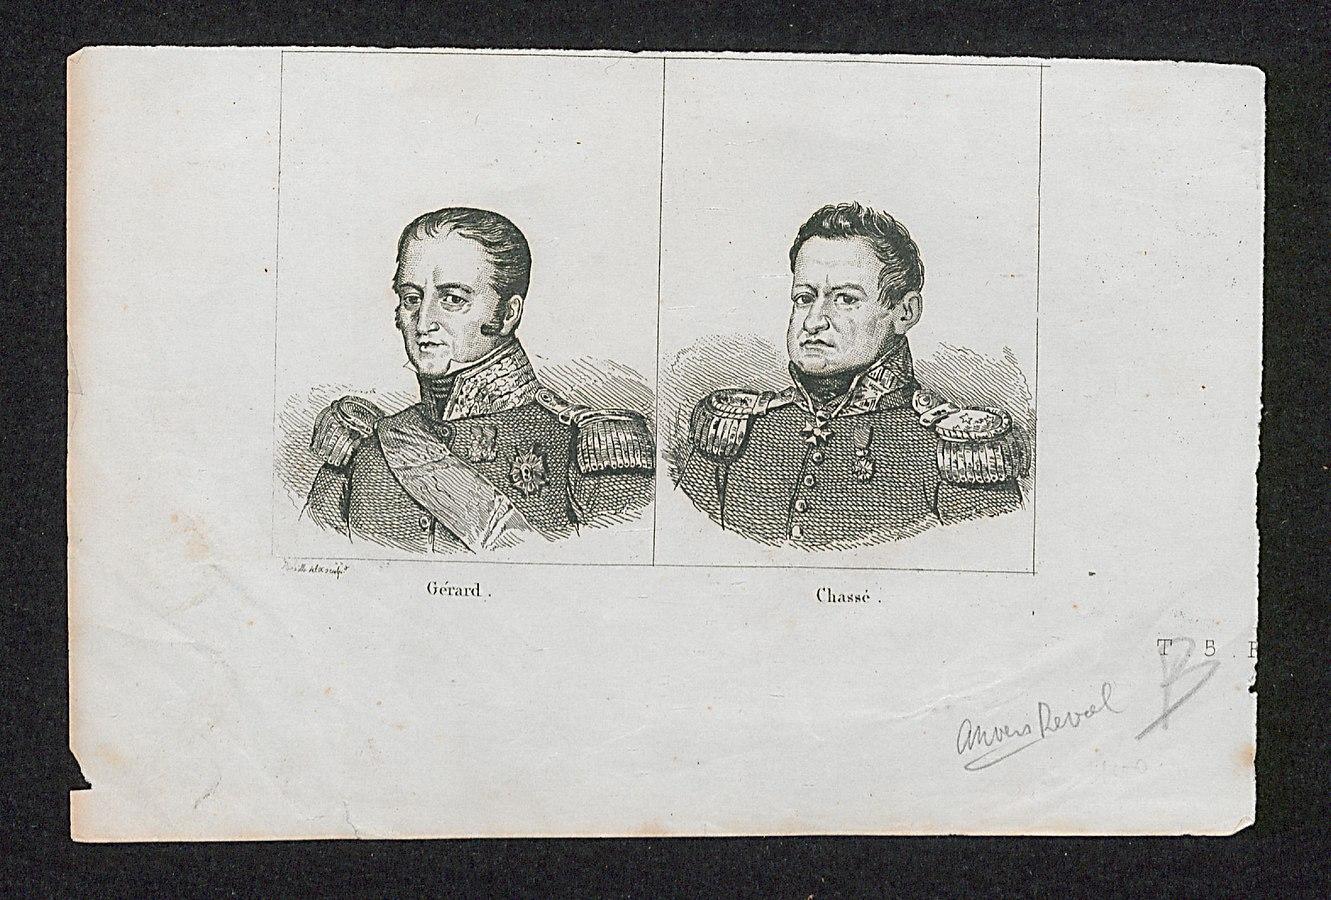 Portretten van de Franse generaal Gérard en de Nederlandse generaal Chassé